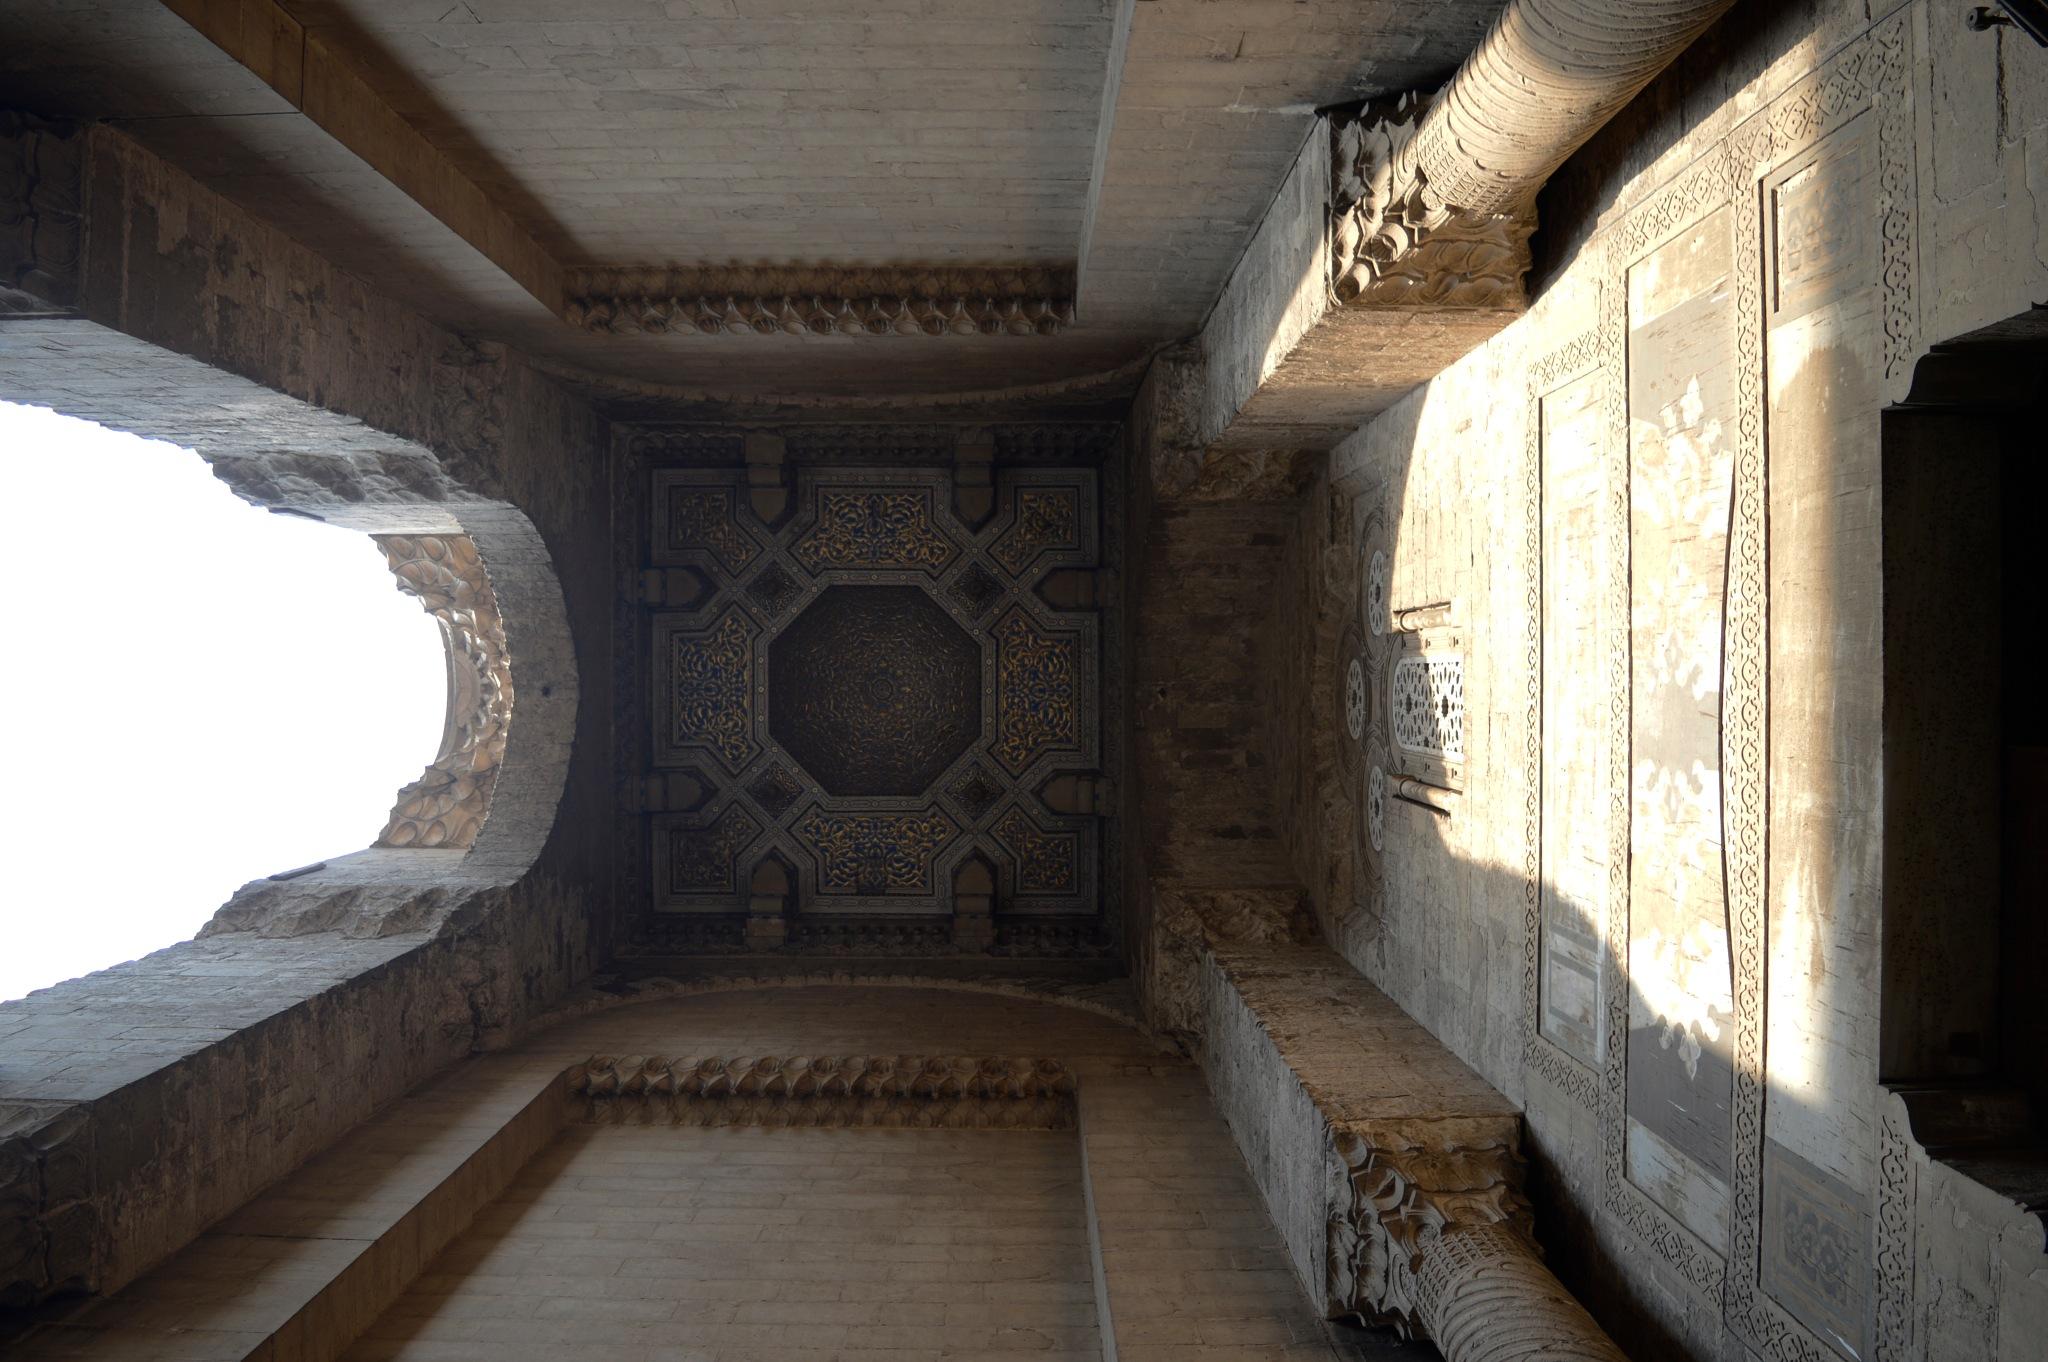 Rifai mosque by OmAr M. Abd-Ulkader